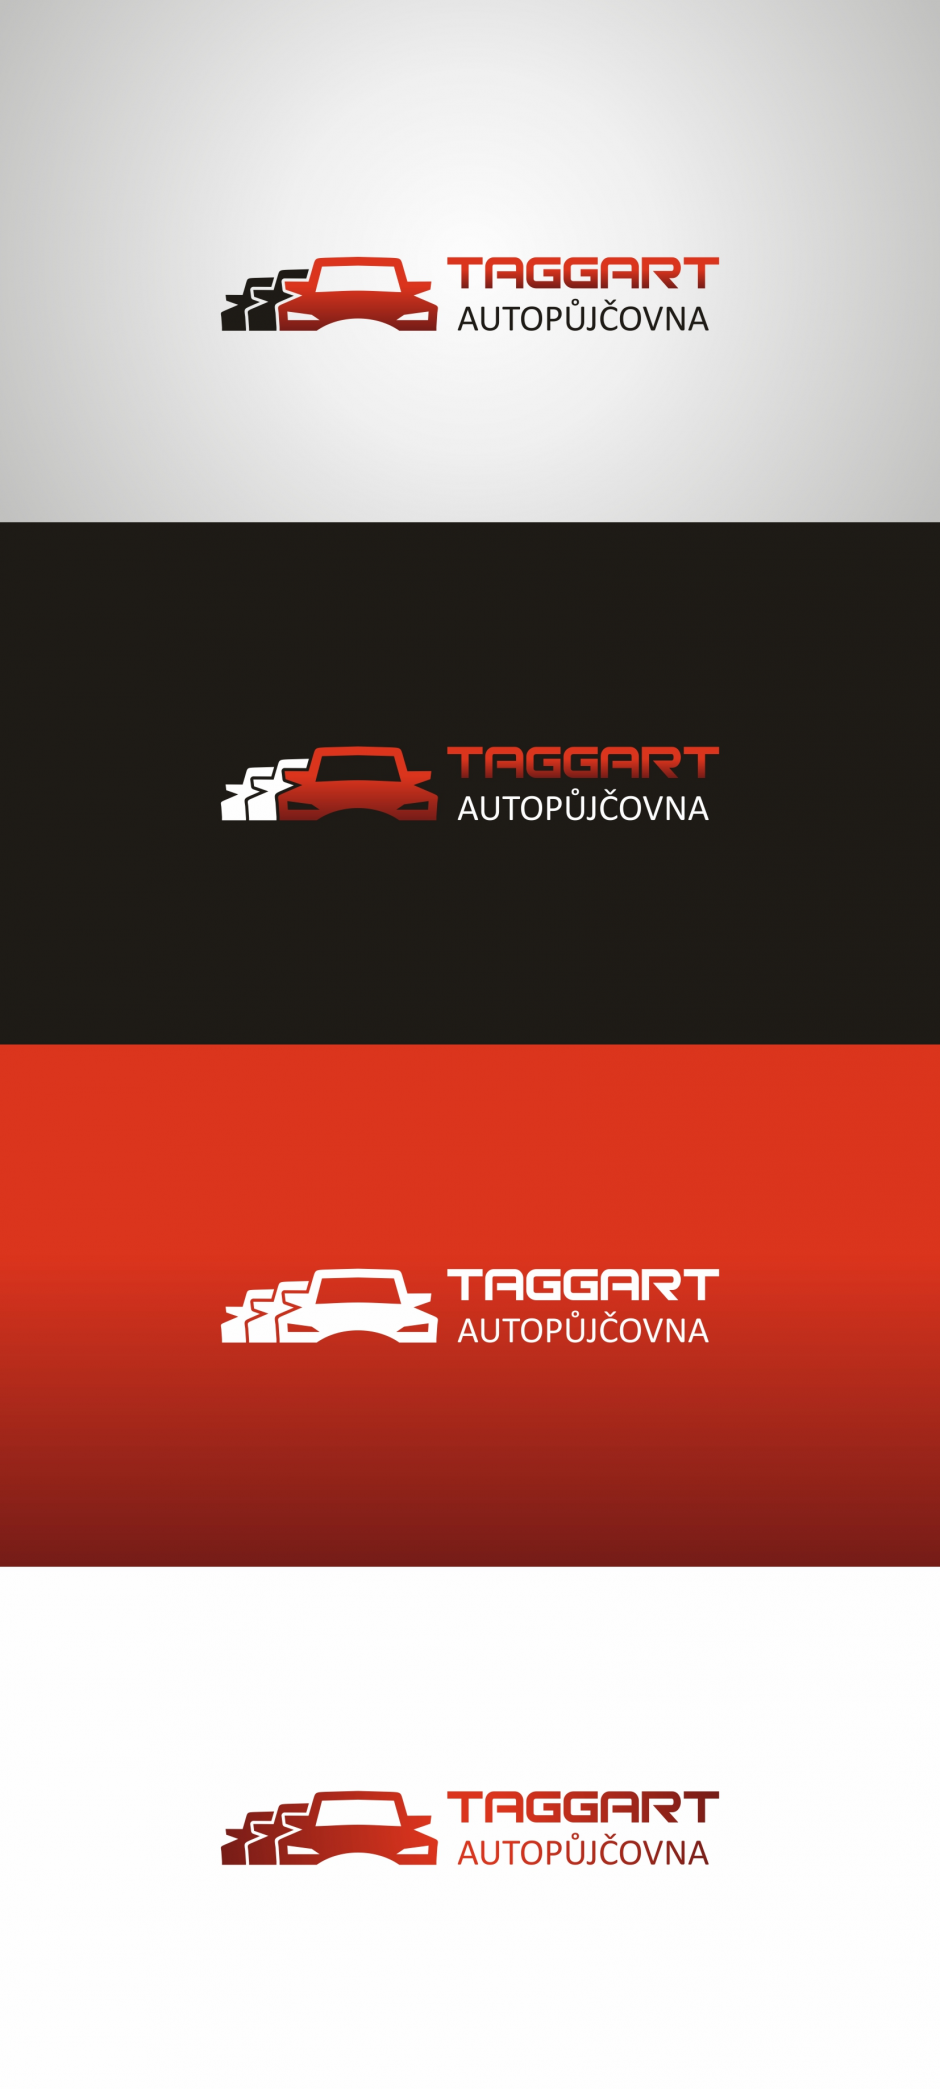 [Logo by Tobi_one]